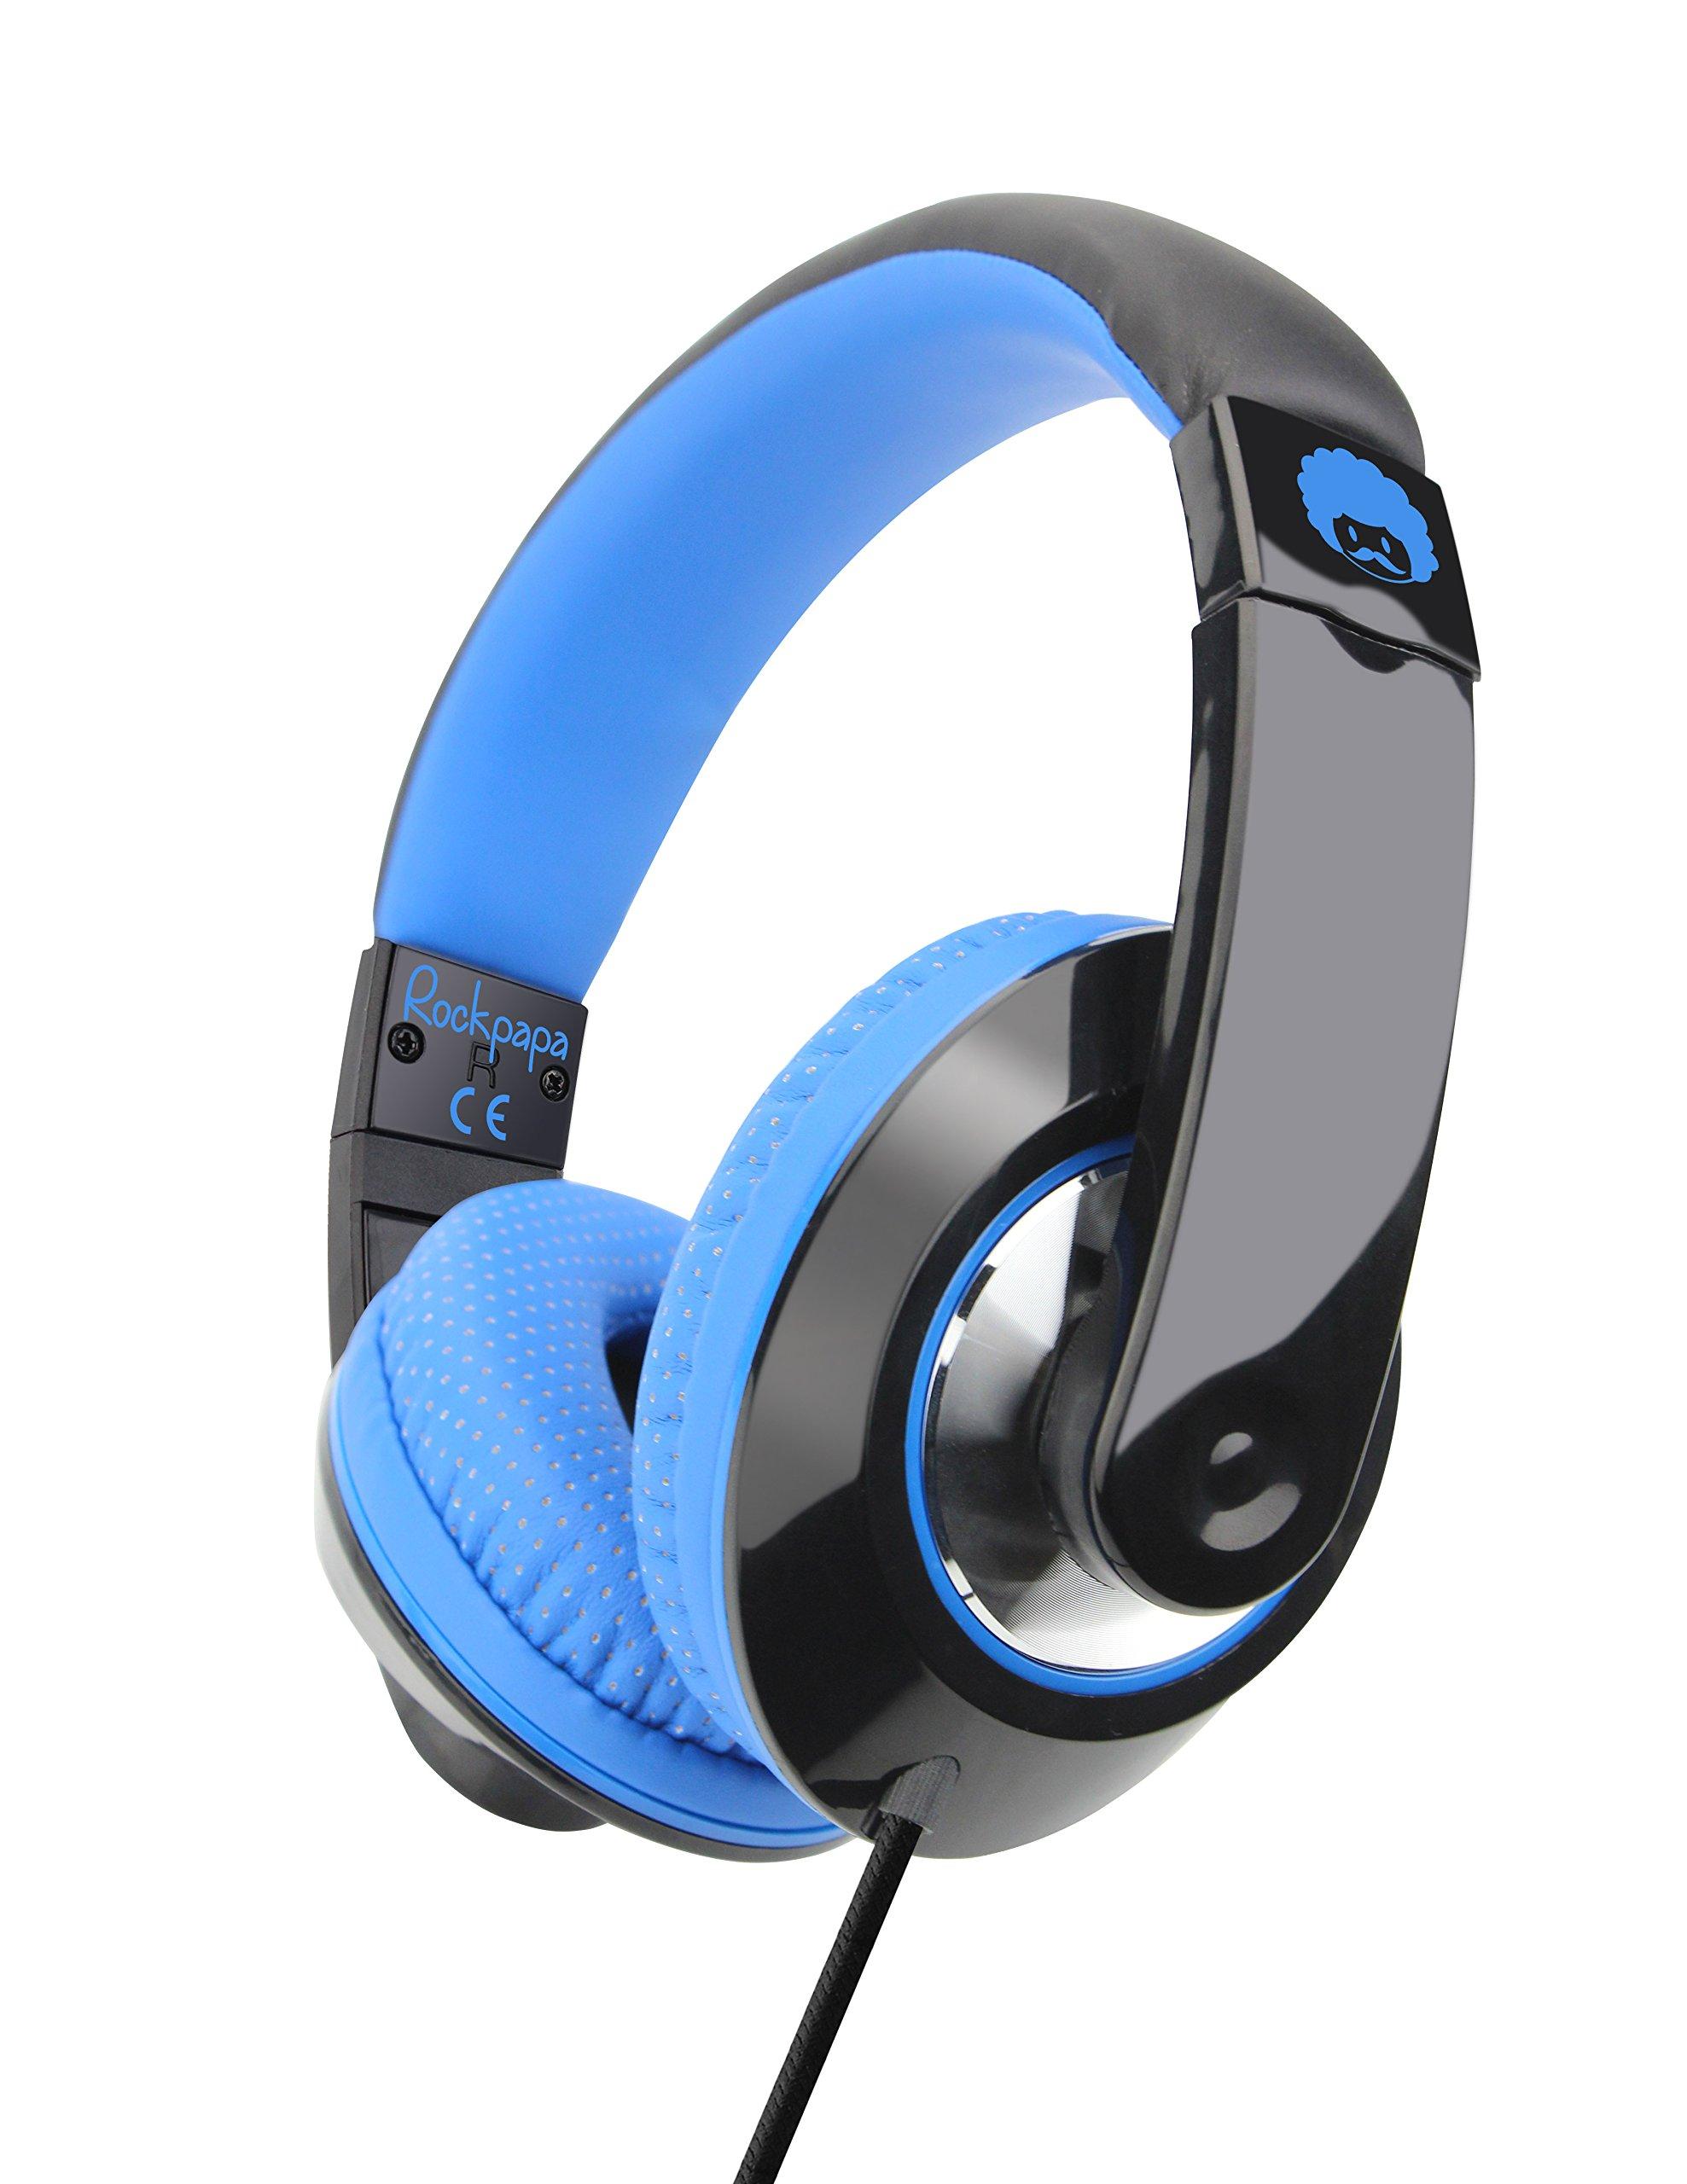 RockPapa 790 Adjustable Over Ear Headphones Earphones with Microphone in-line Volume for Adults Kids Childs, Smartphones Laptops DVD MP3/4 Surface iPhone iPod iPad MacBook Black Blue